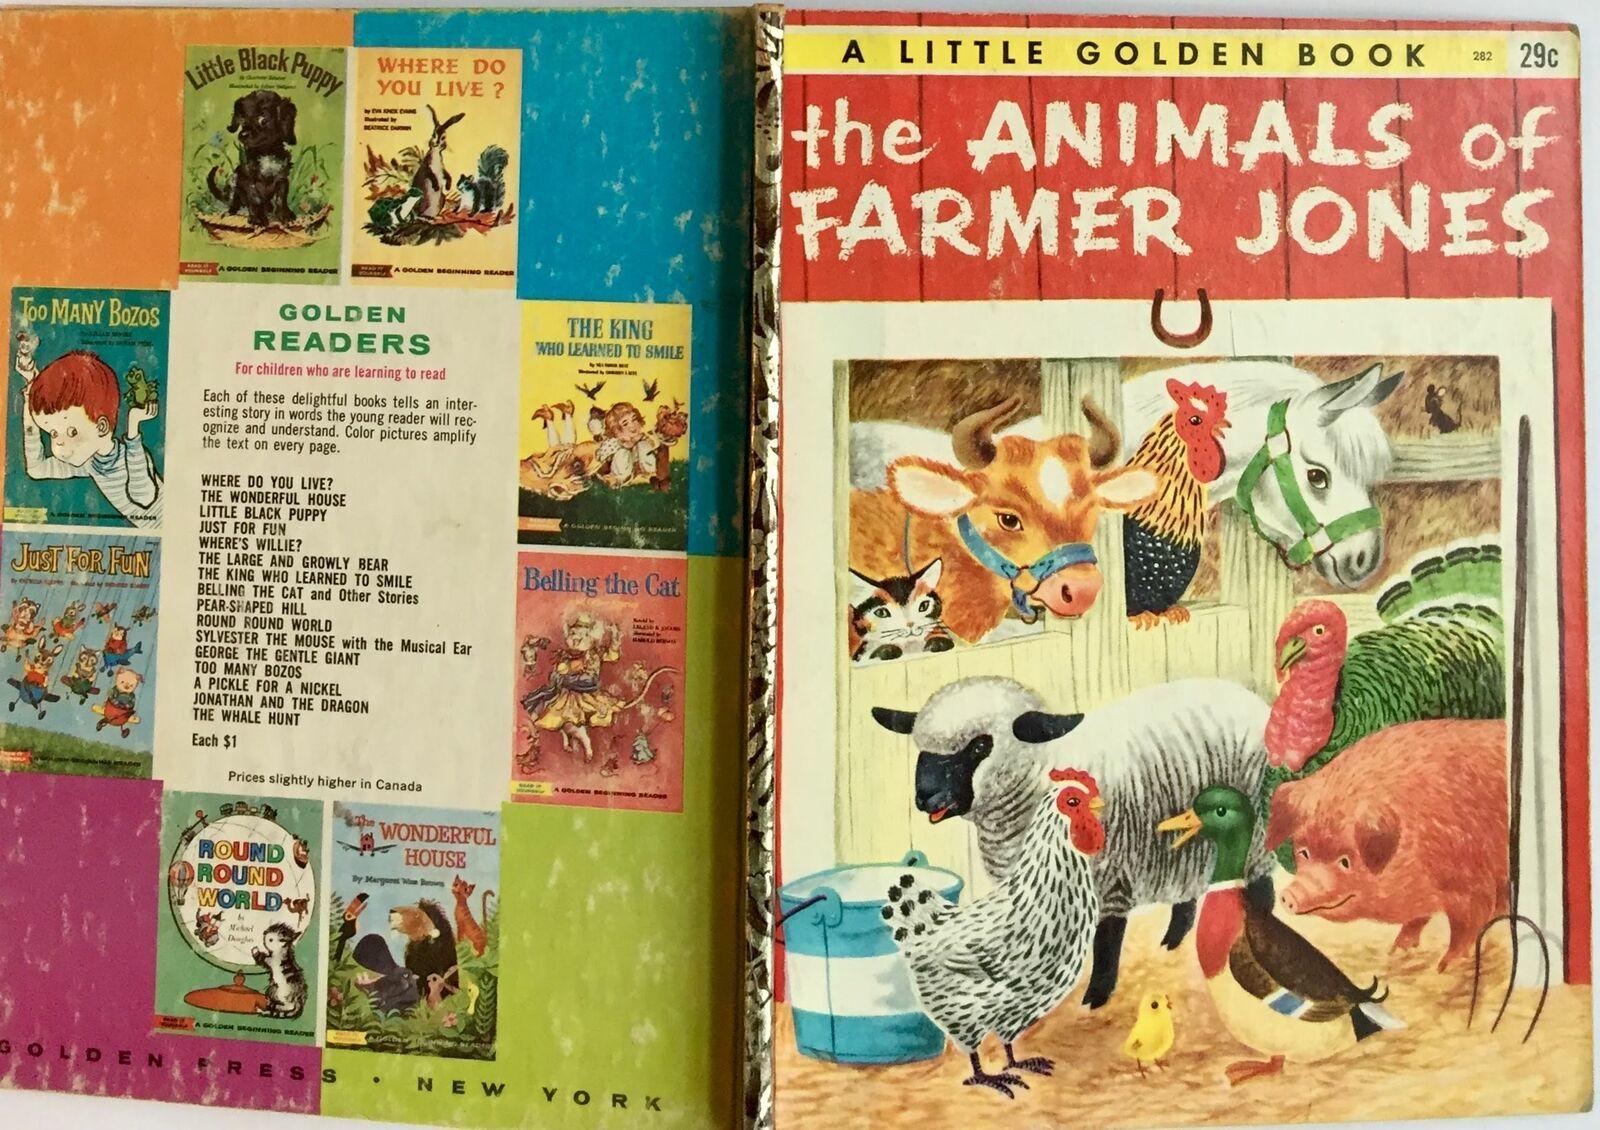 The Animals of Farmer Jones Little Golden Book 1953 G edition Scarry